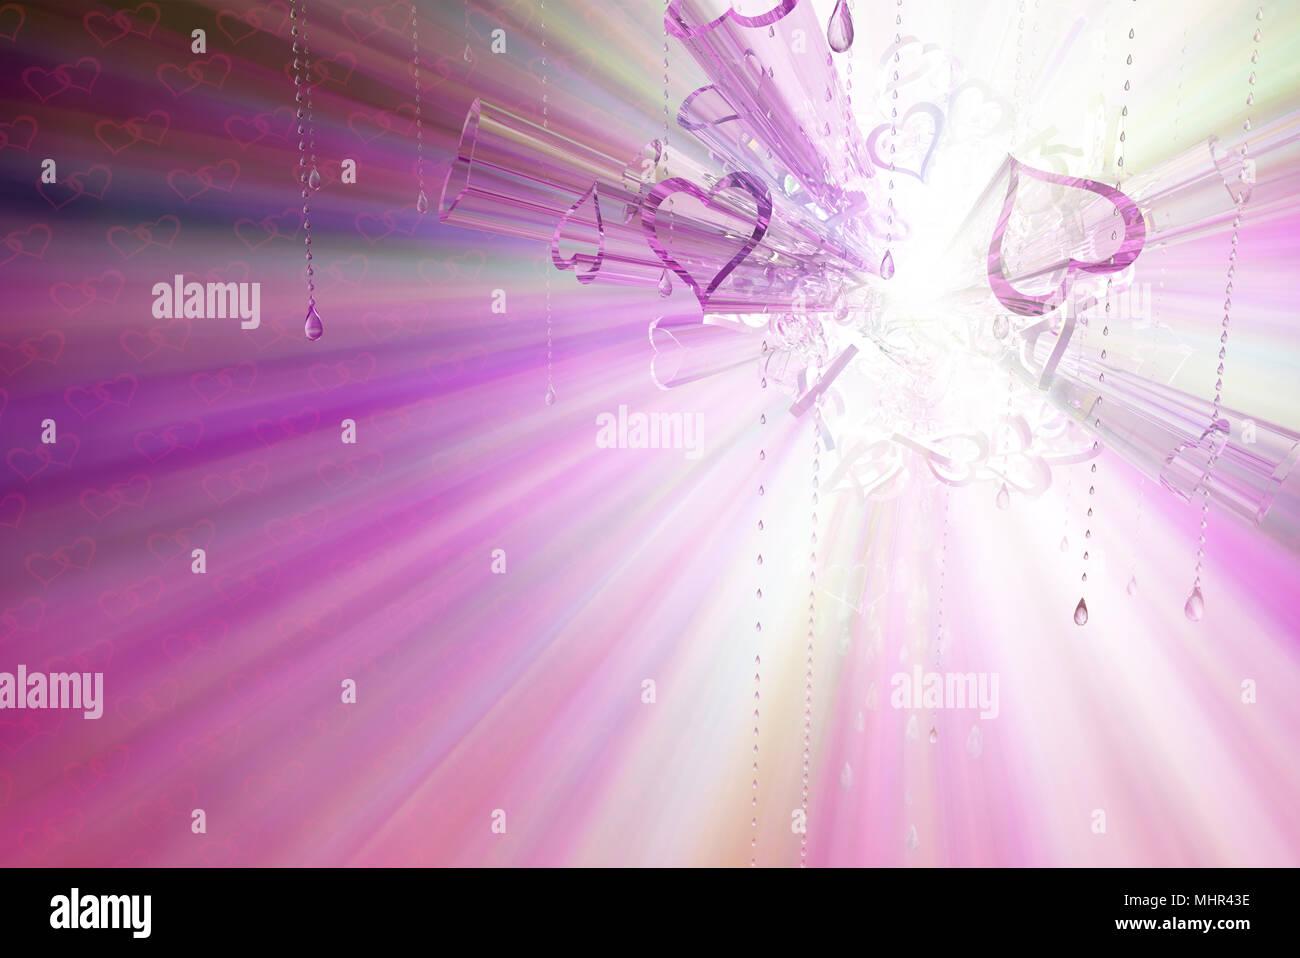 Light spectrum 3d Valentine heart symbol abstract, horizontal - Stock Image